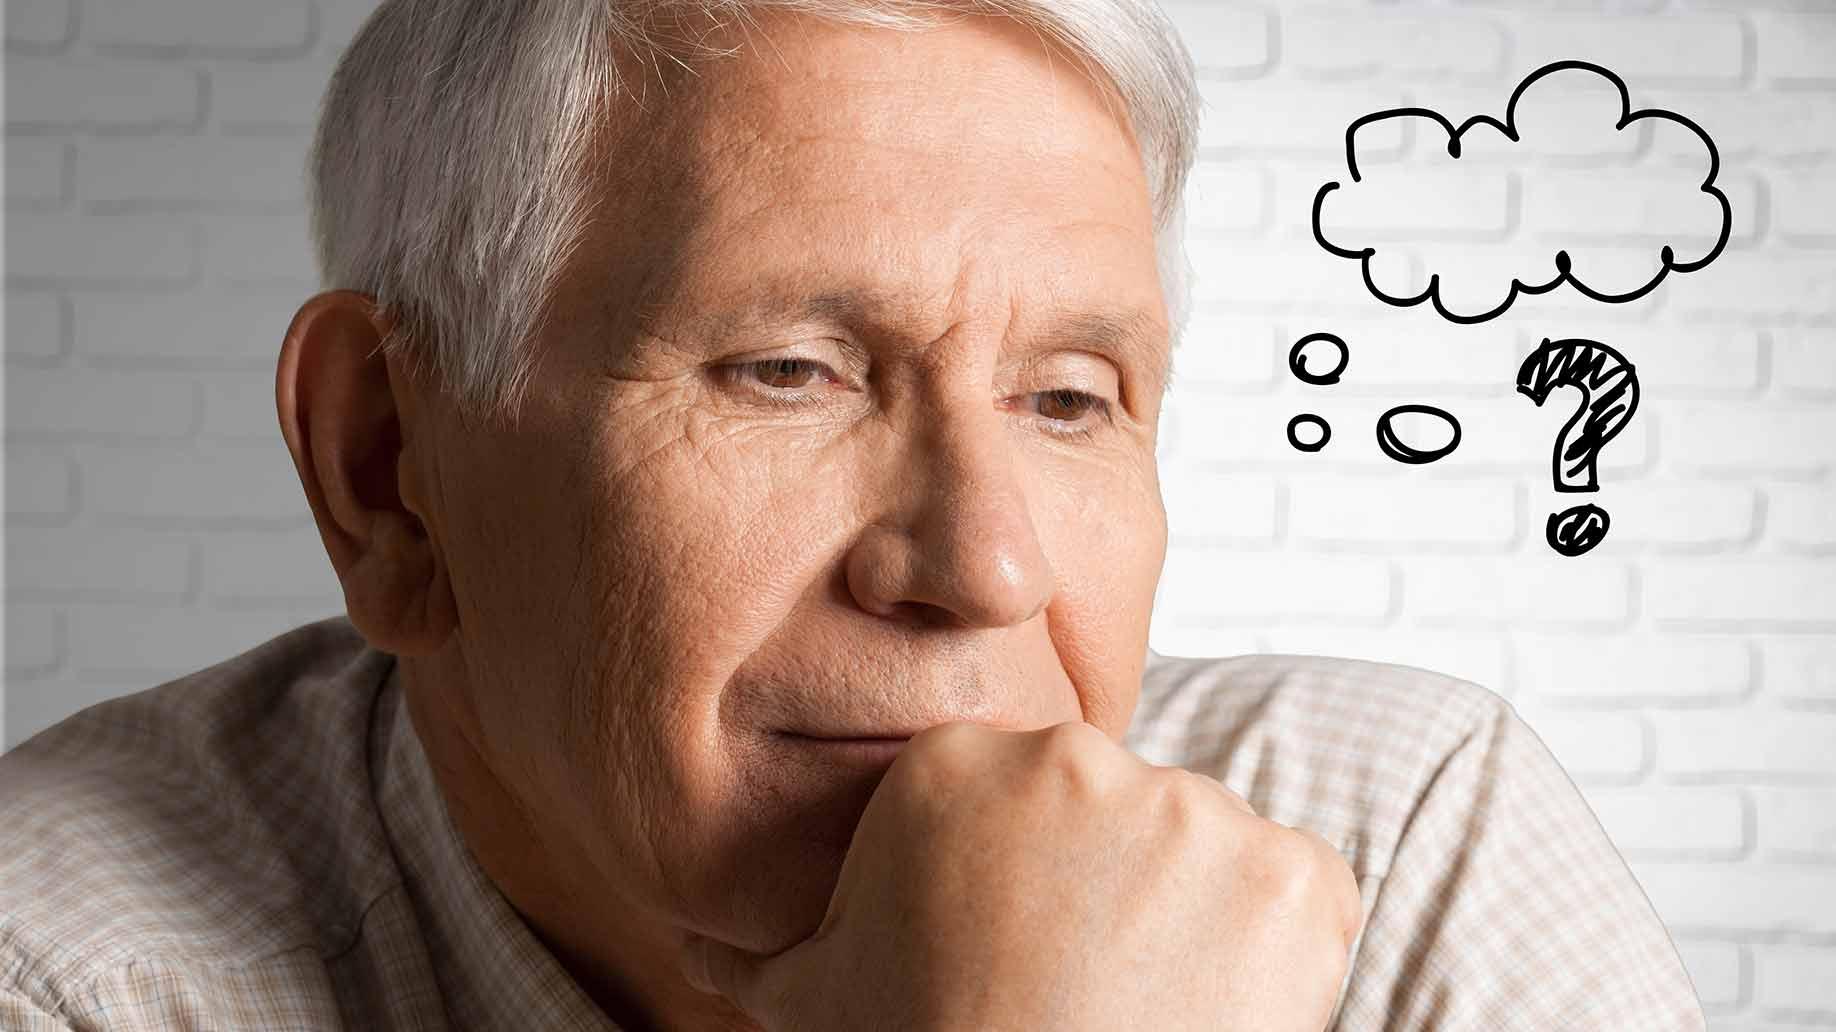 Alzheimers disease dementia forgetful memory brain disorder elderly natural remedies turmeric curcimun health benefits